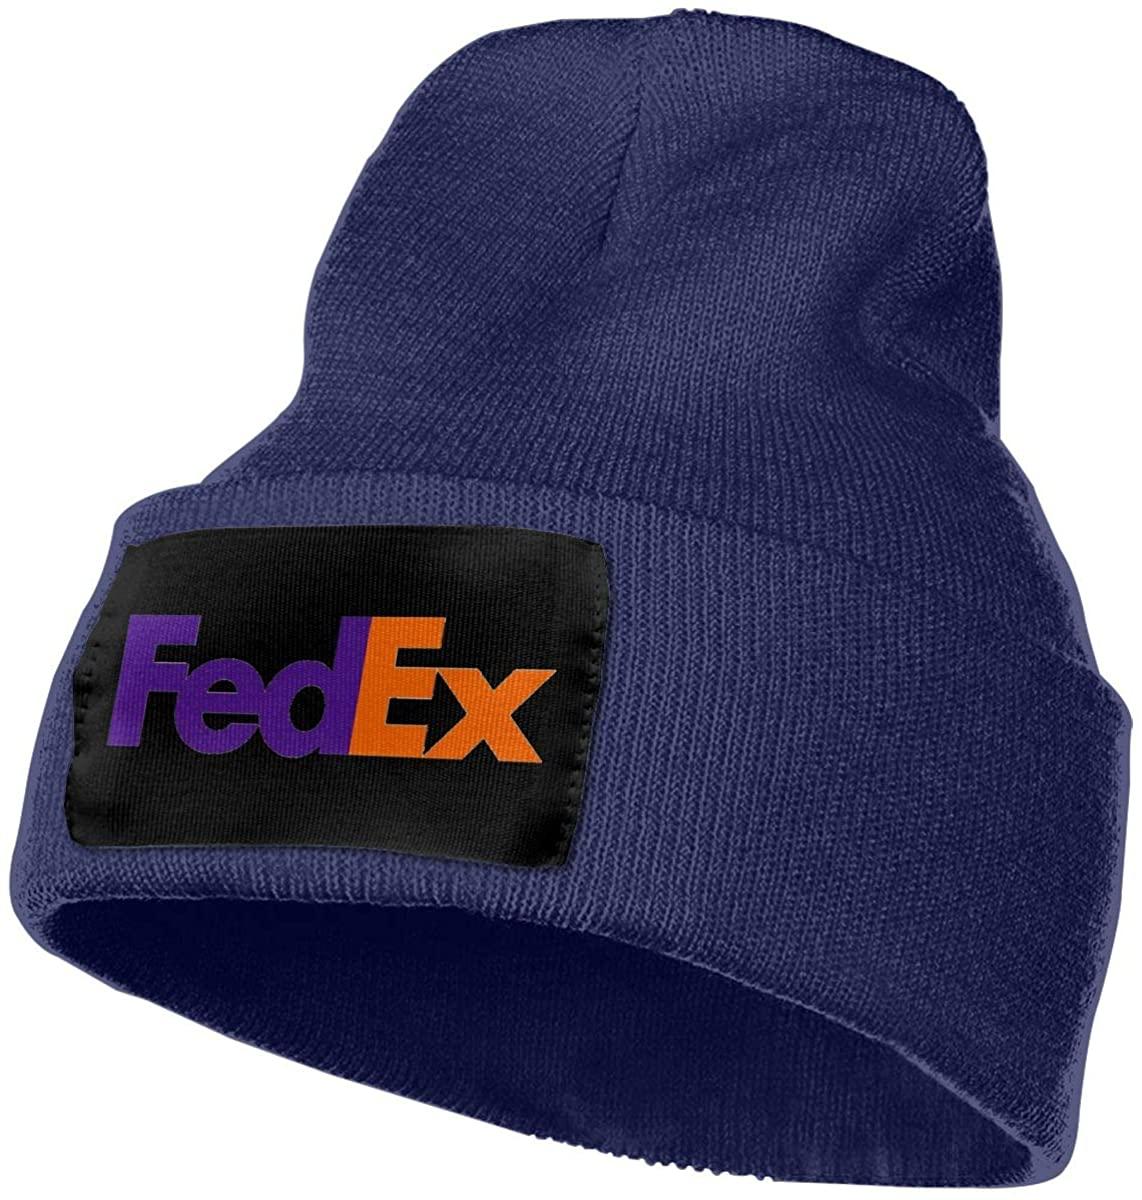 Hxuedan FedEx Warm Knit Cuff Beanie Cap Daily Beanie Hat for Men